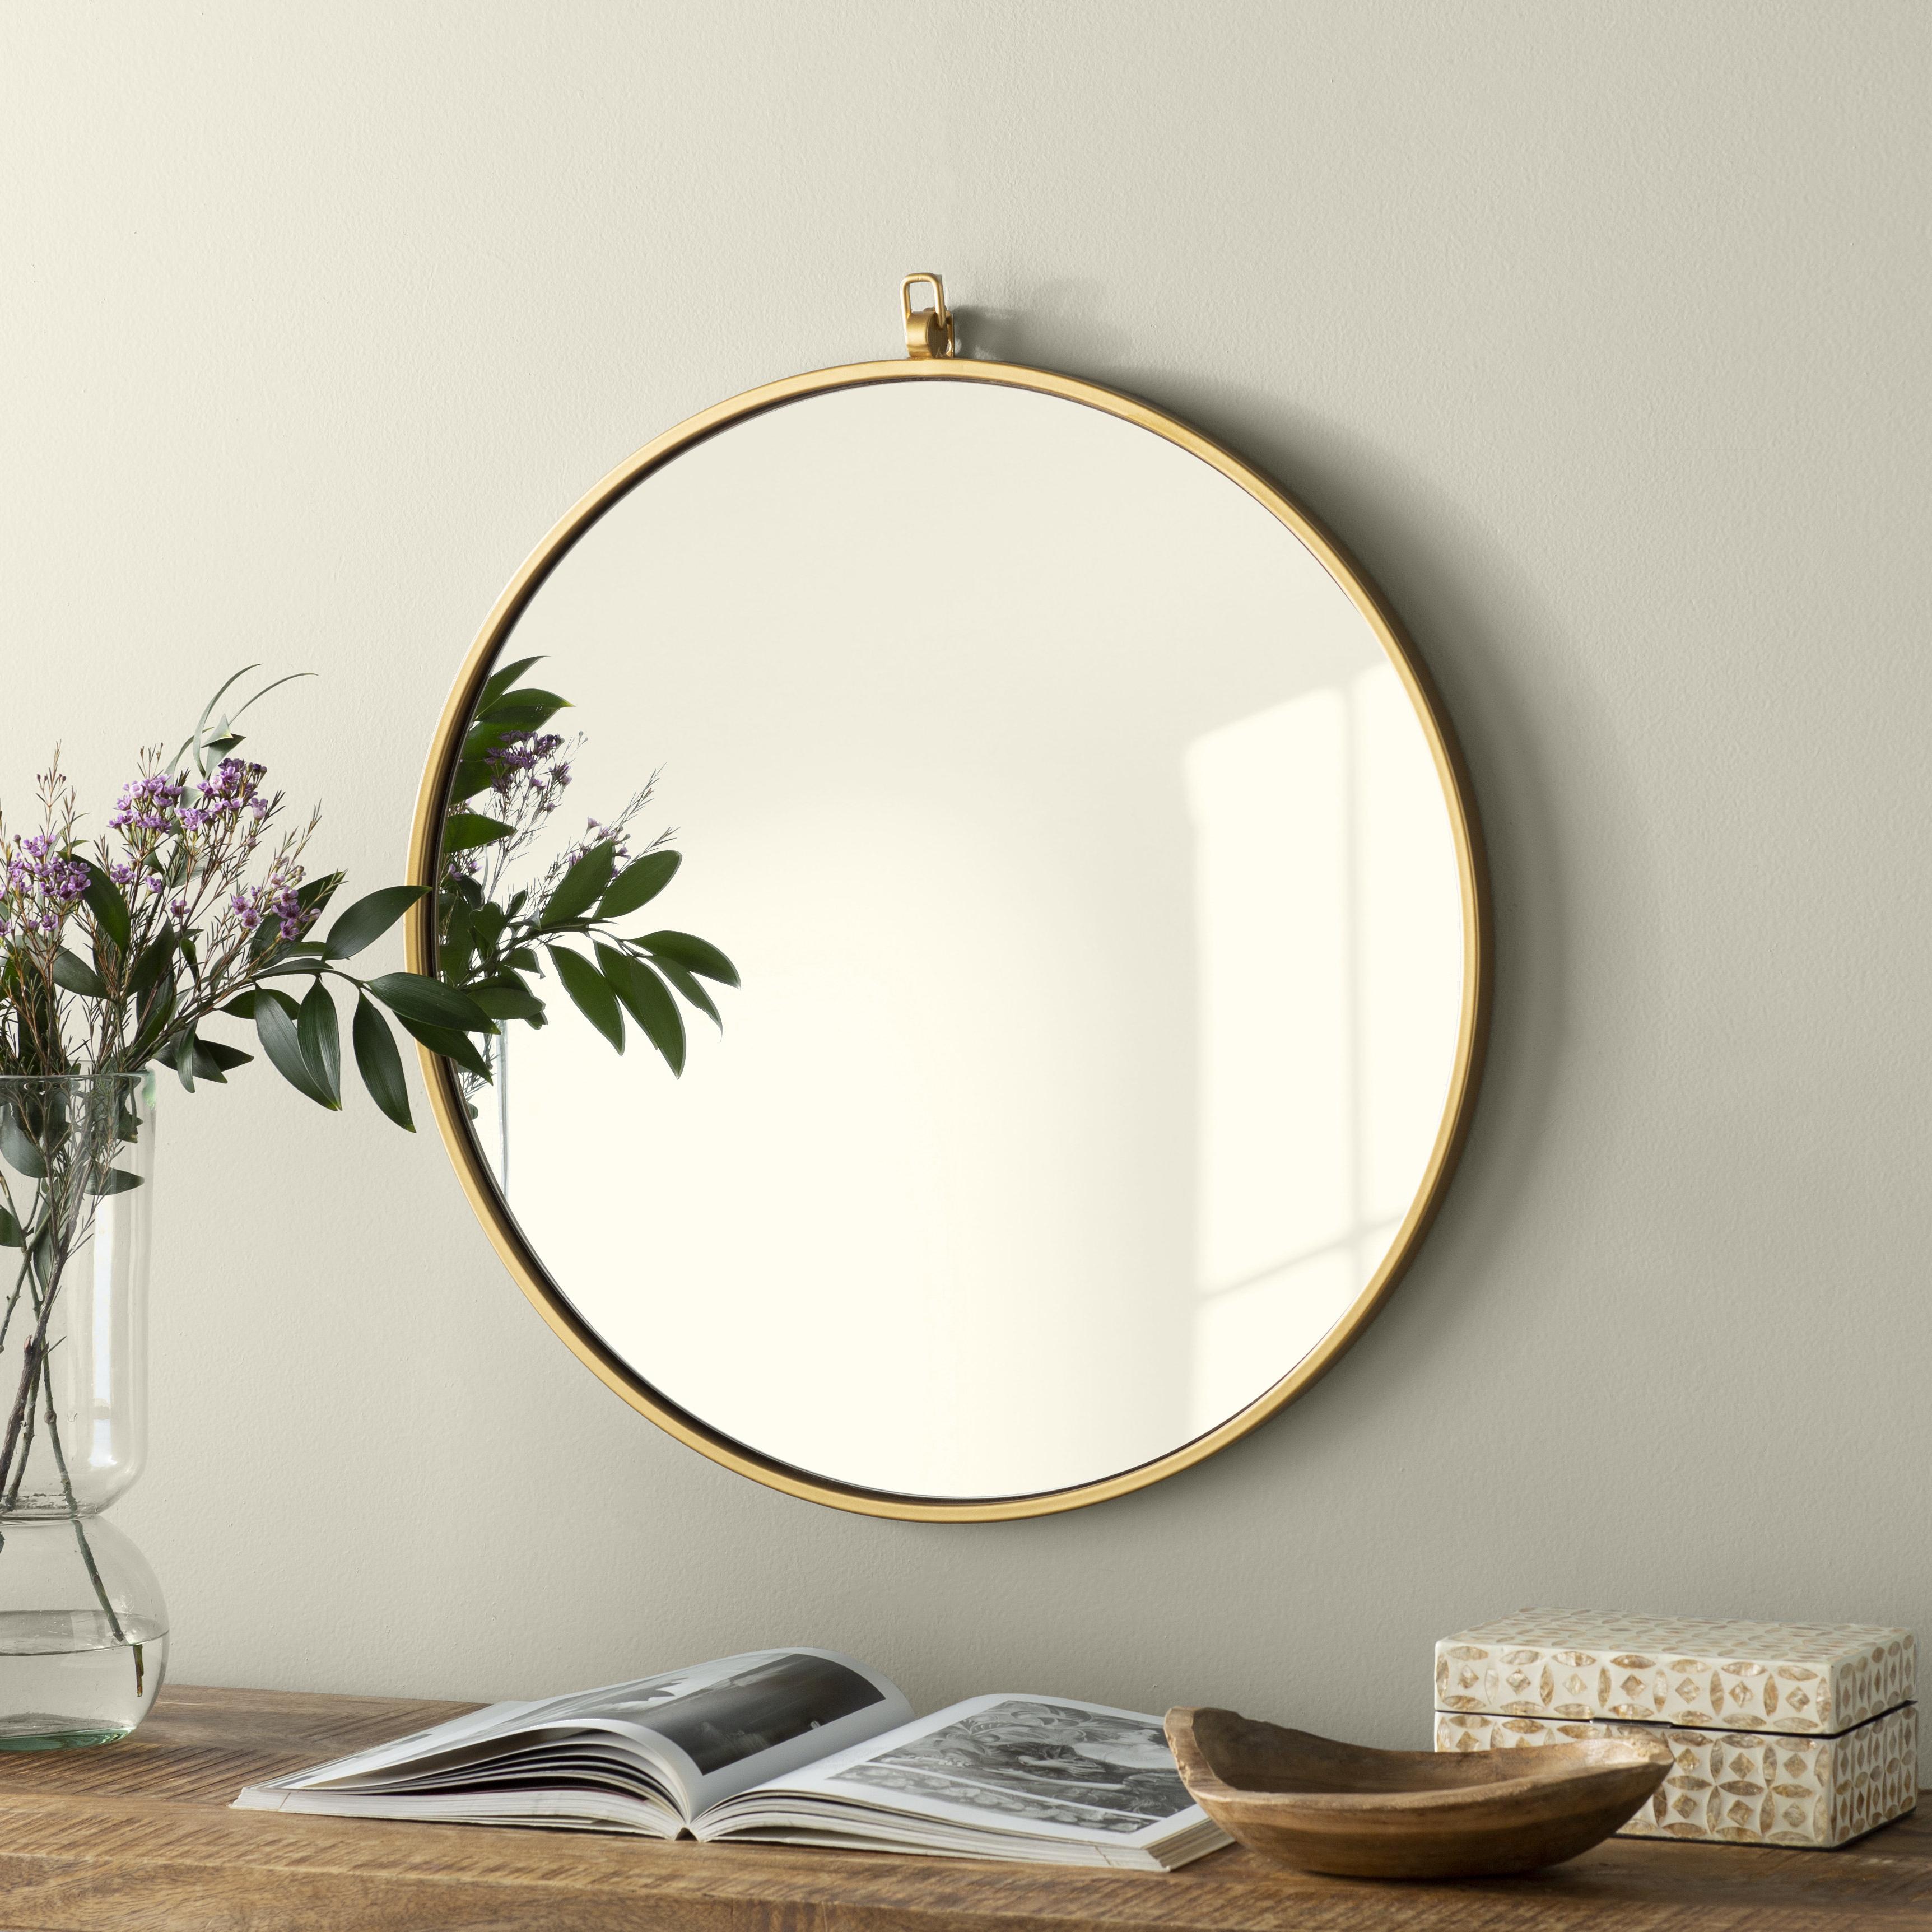 Minerva Accent Mirrors In Most Popular Joss & Main Essentials Accent Mirror (Gallery 10 of 20)